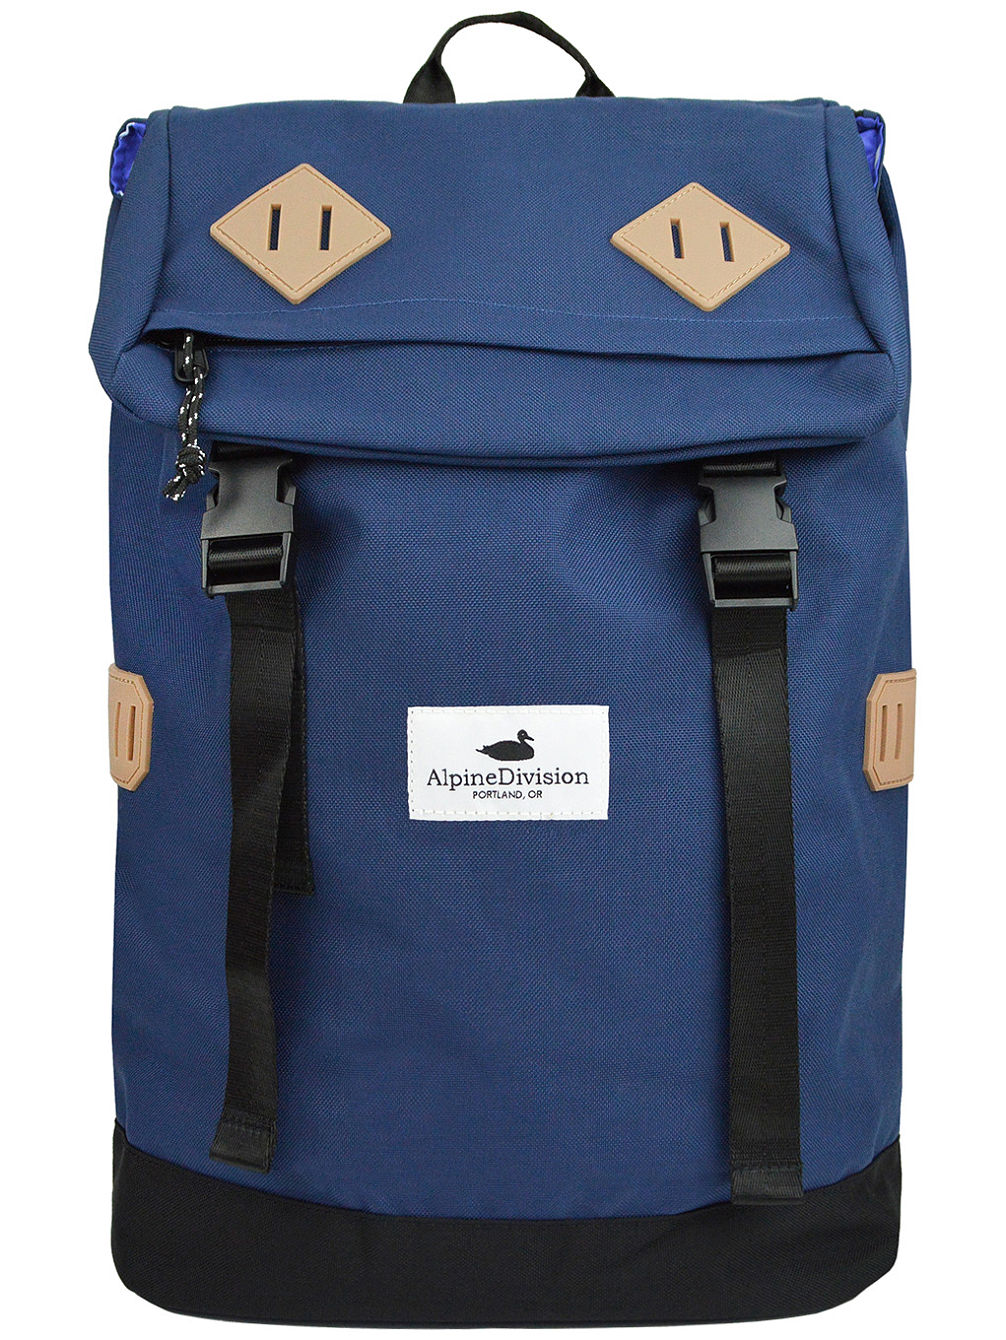 Buy Alpine Division McKenzie Backpack online at blue-tomato.com a3696f52d67d1